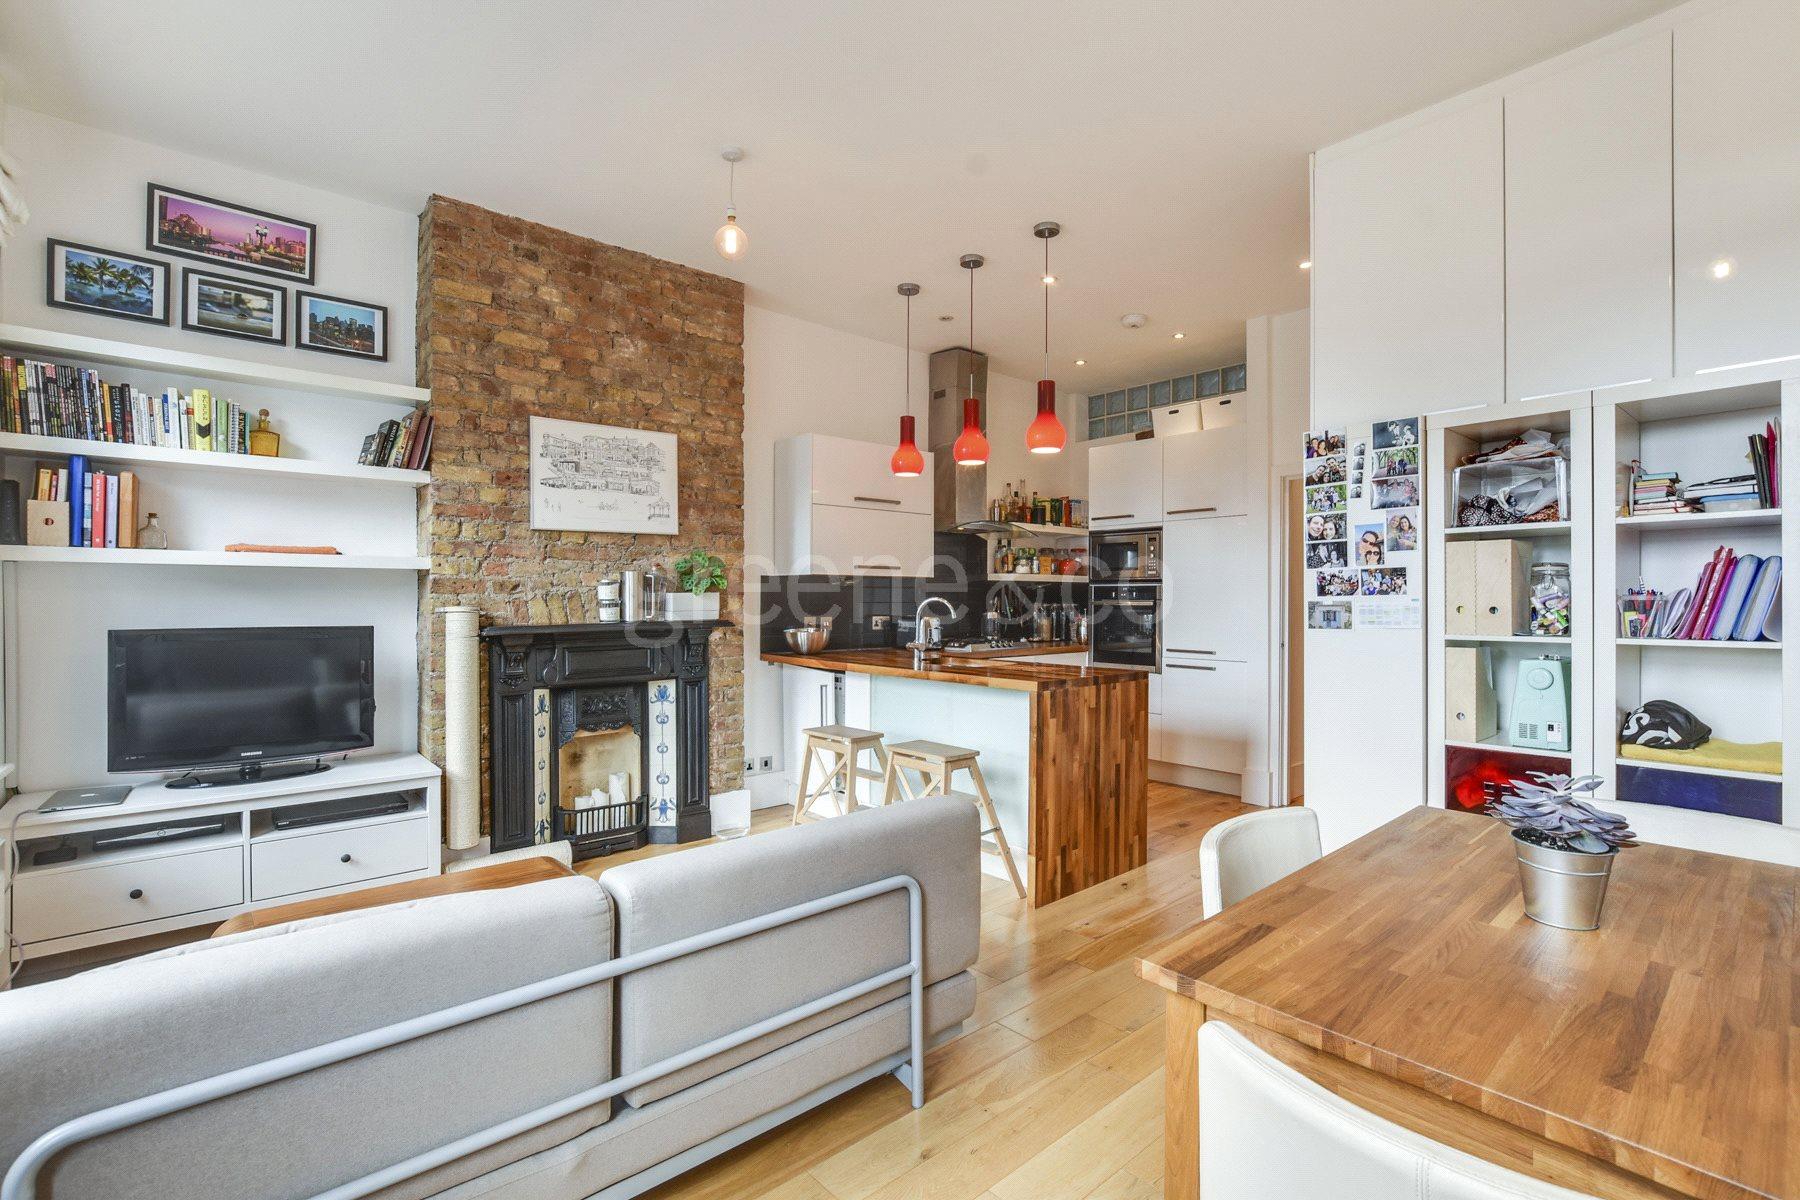 1 Bedroom Flat for sale in Willesden Lane, Kilburn, London, NW6